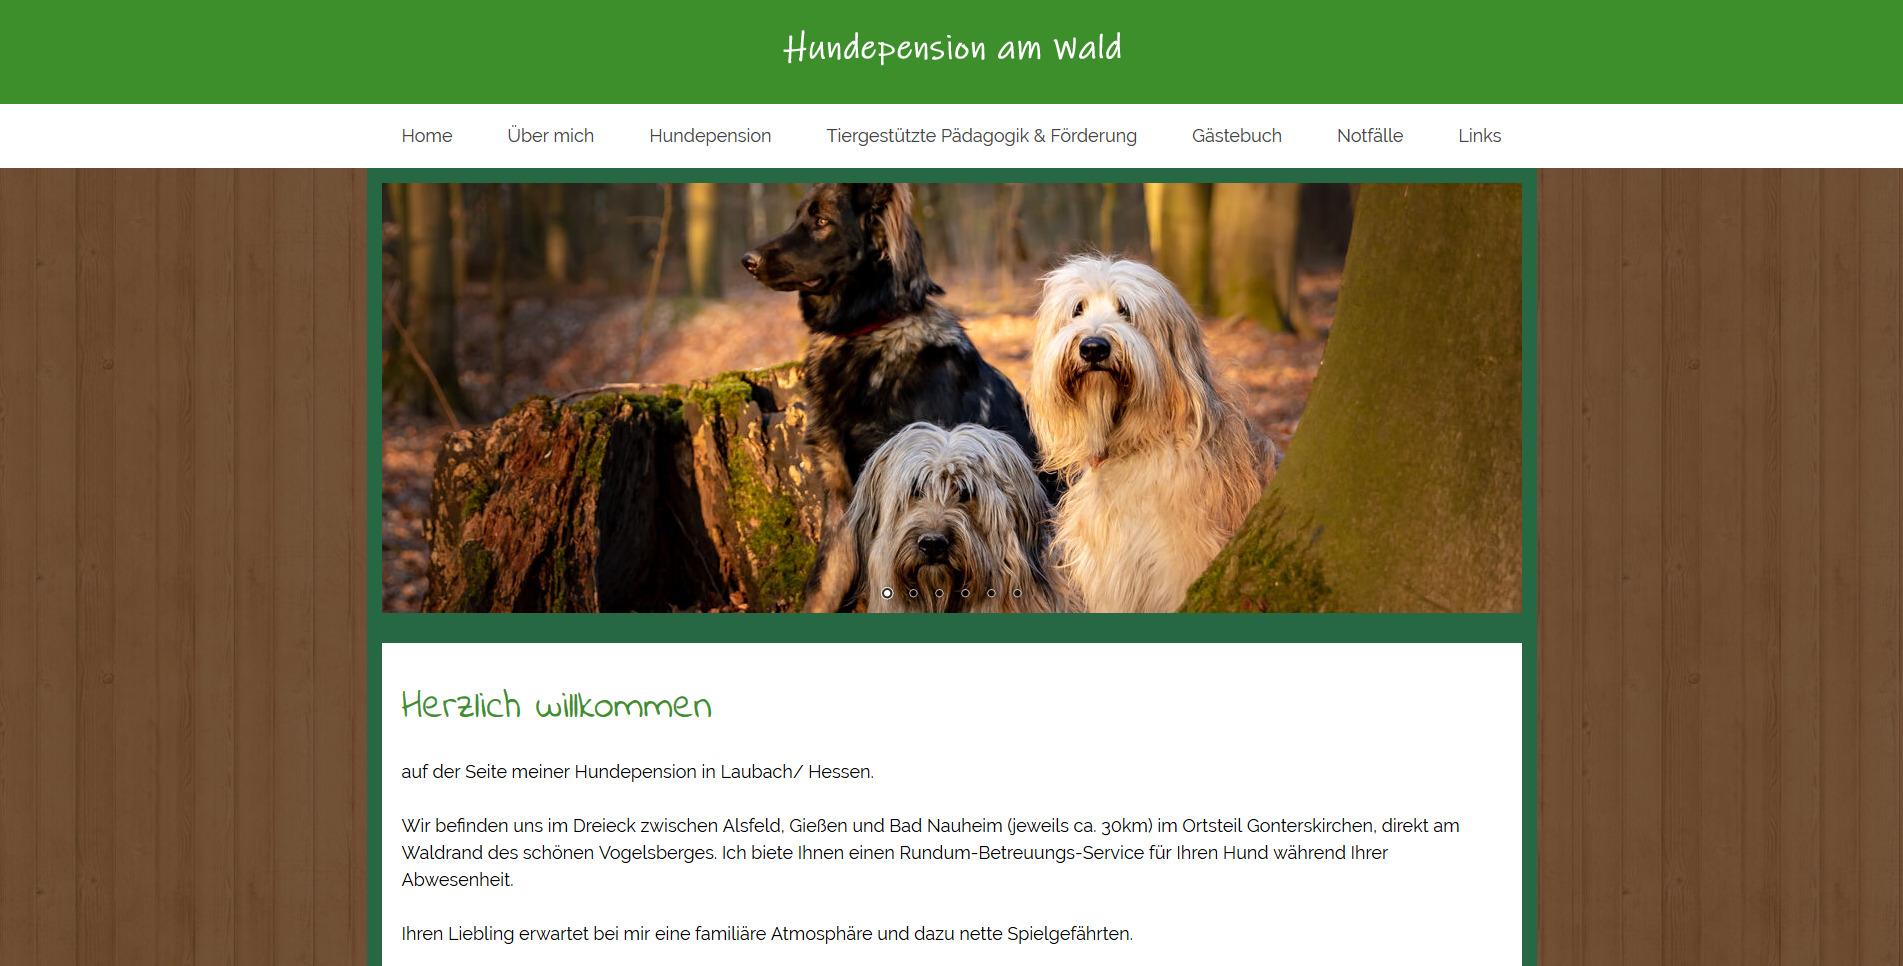 Hundepension am Wald